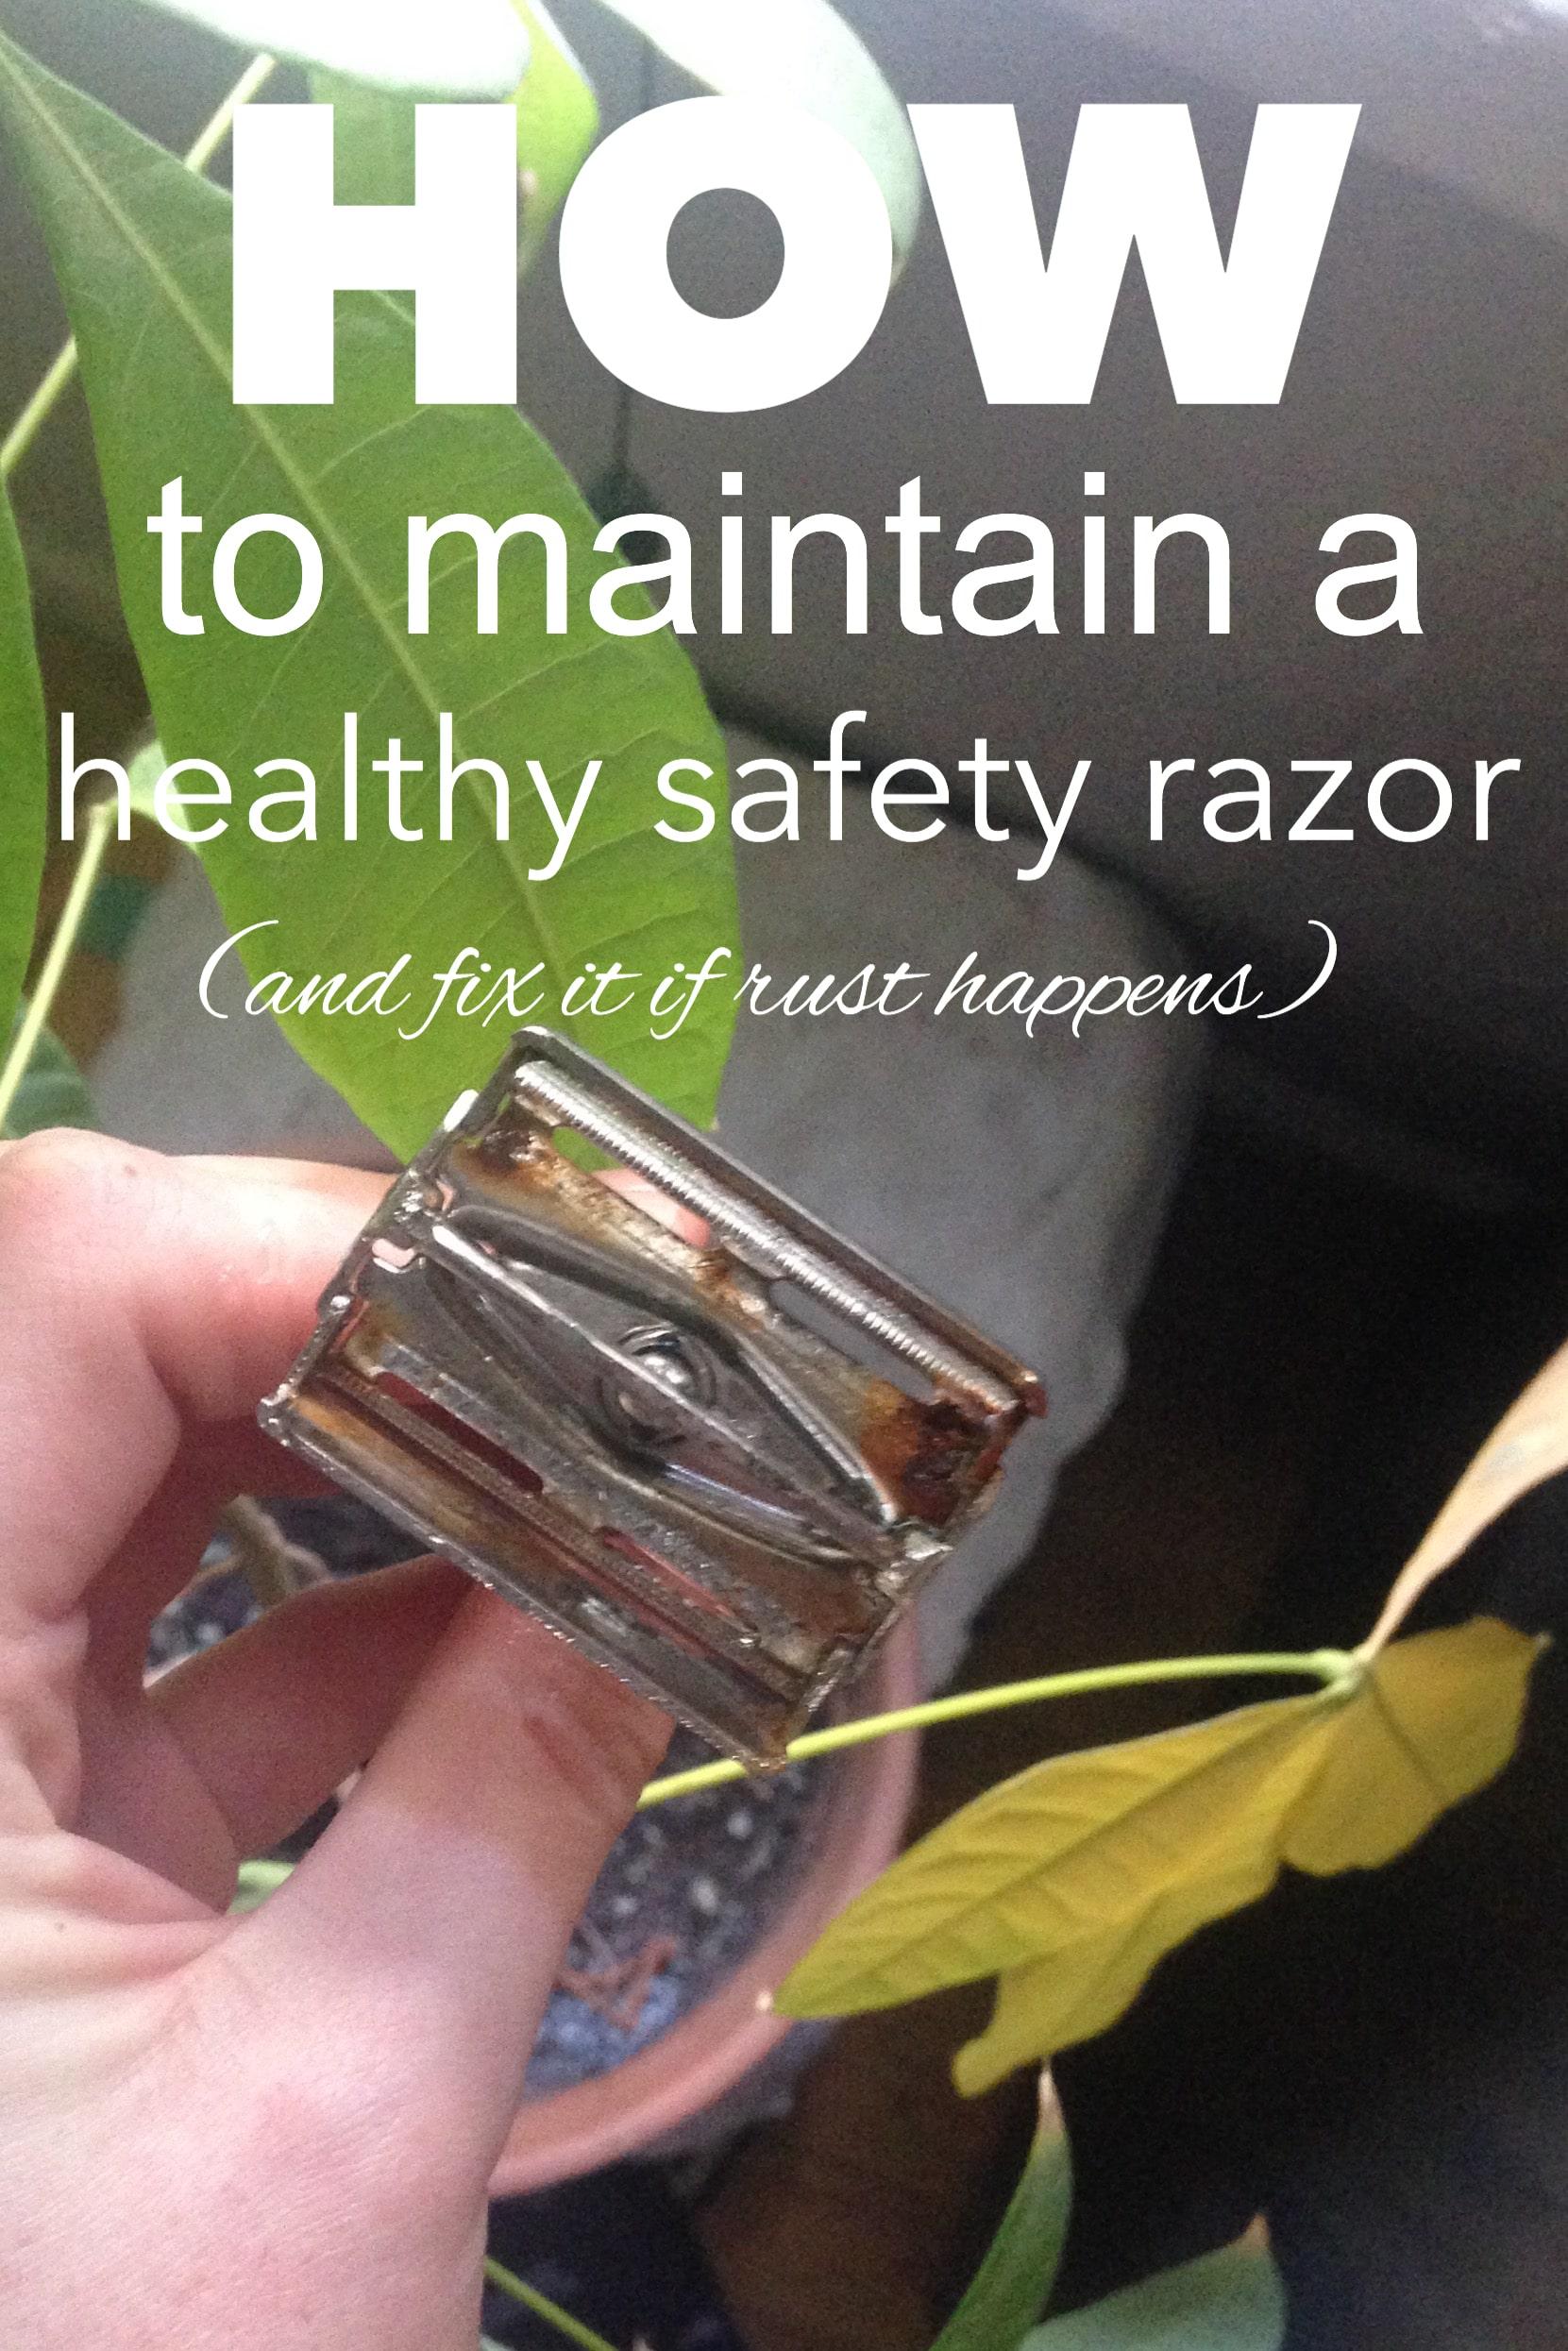 how to maintain a healthy safety razor from www.goingzerowaste.com #safetyrazor #sustainable #zerowaste #gogreen #lowwaste #shaving #razors #cleaning #DIY